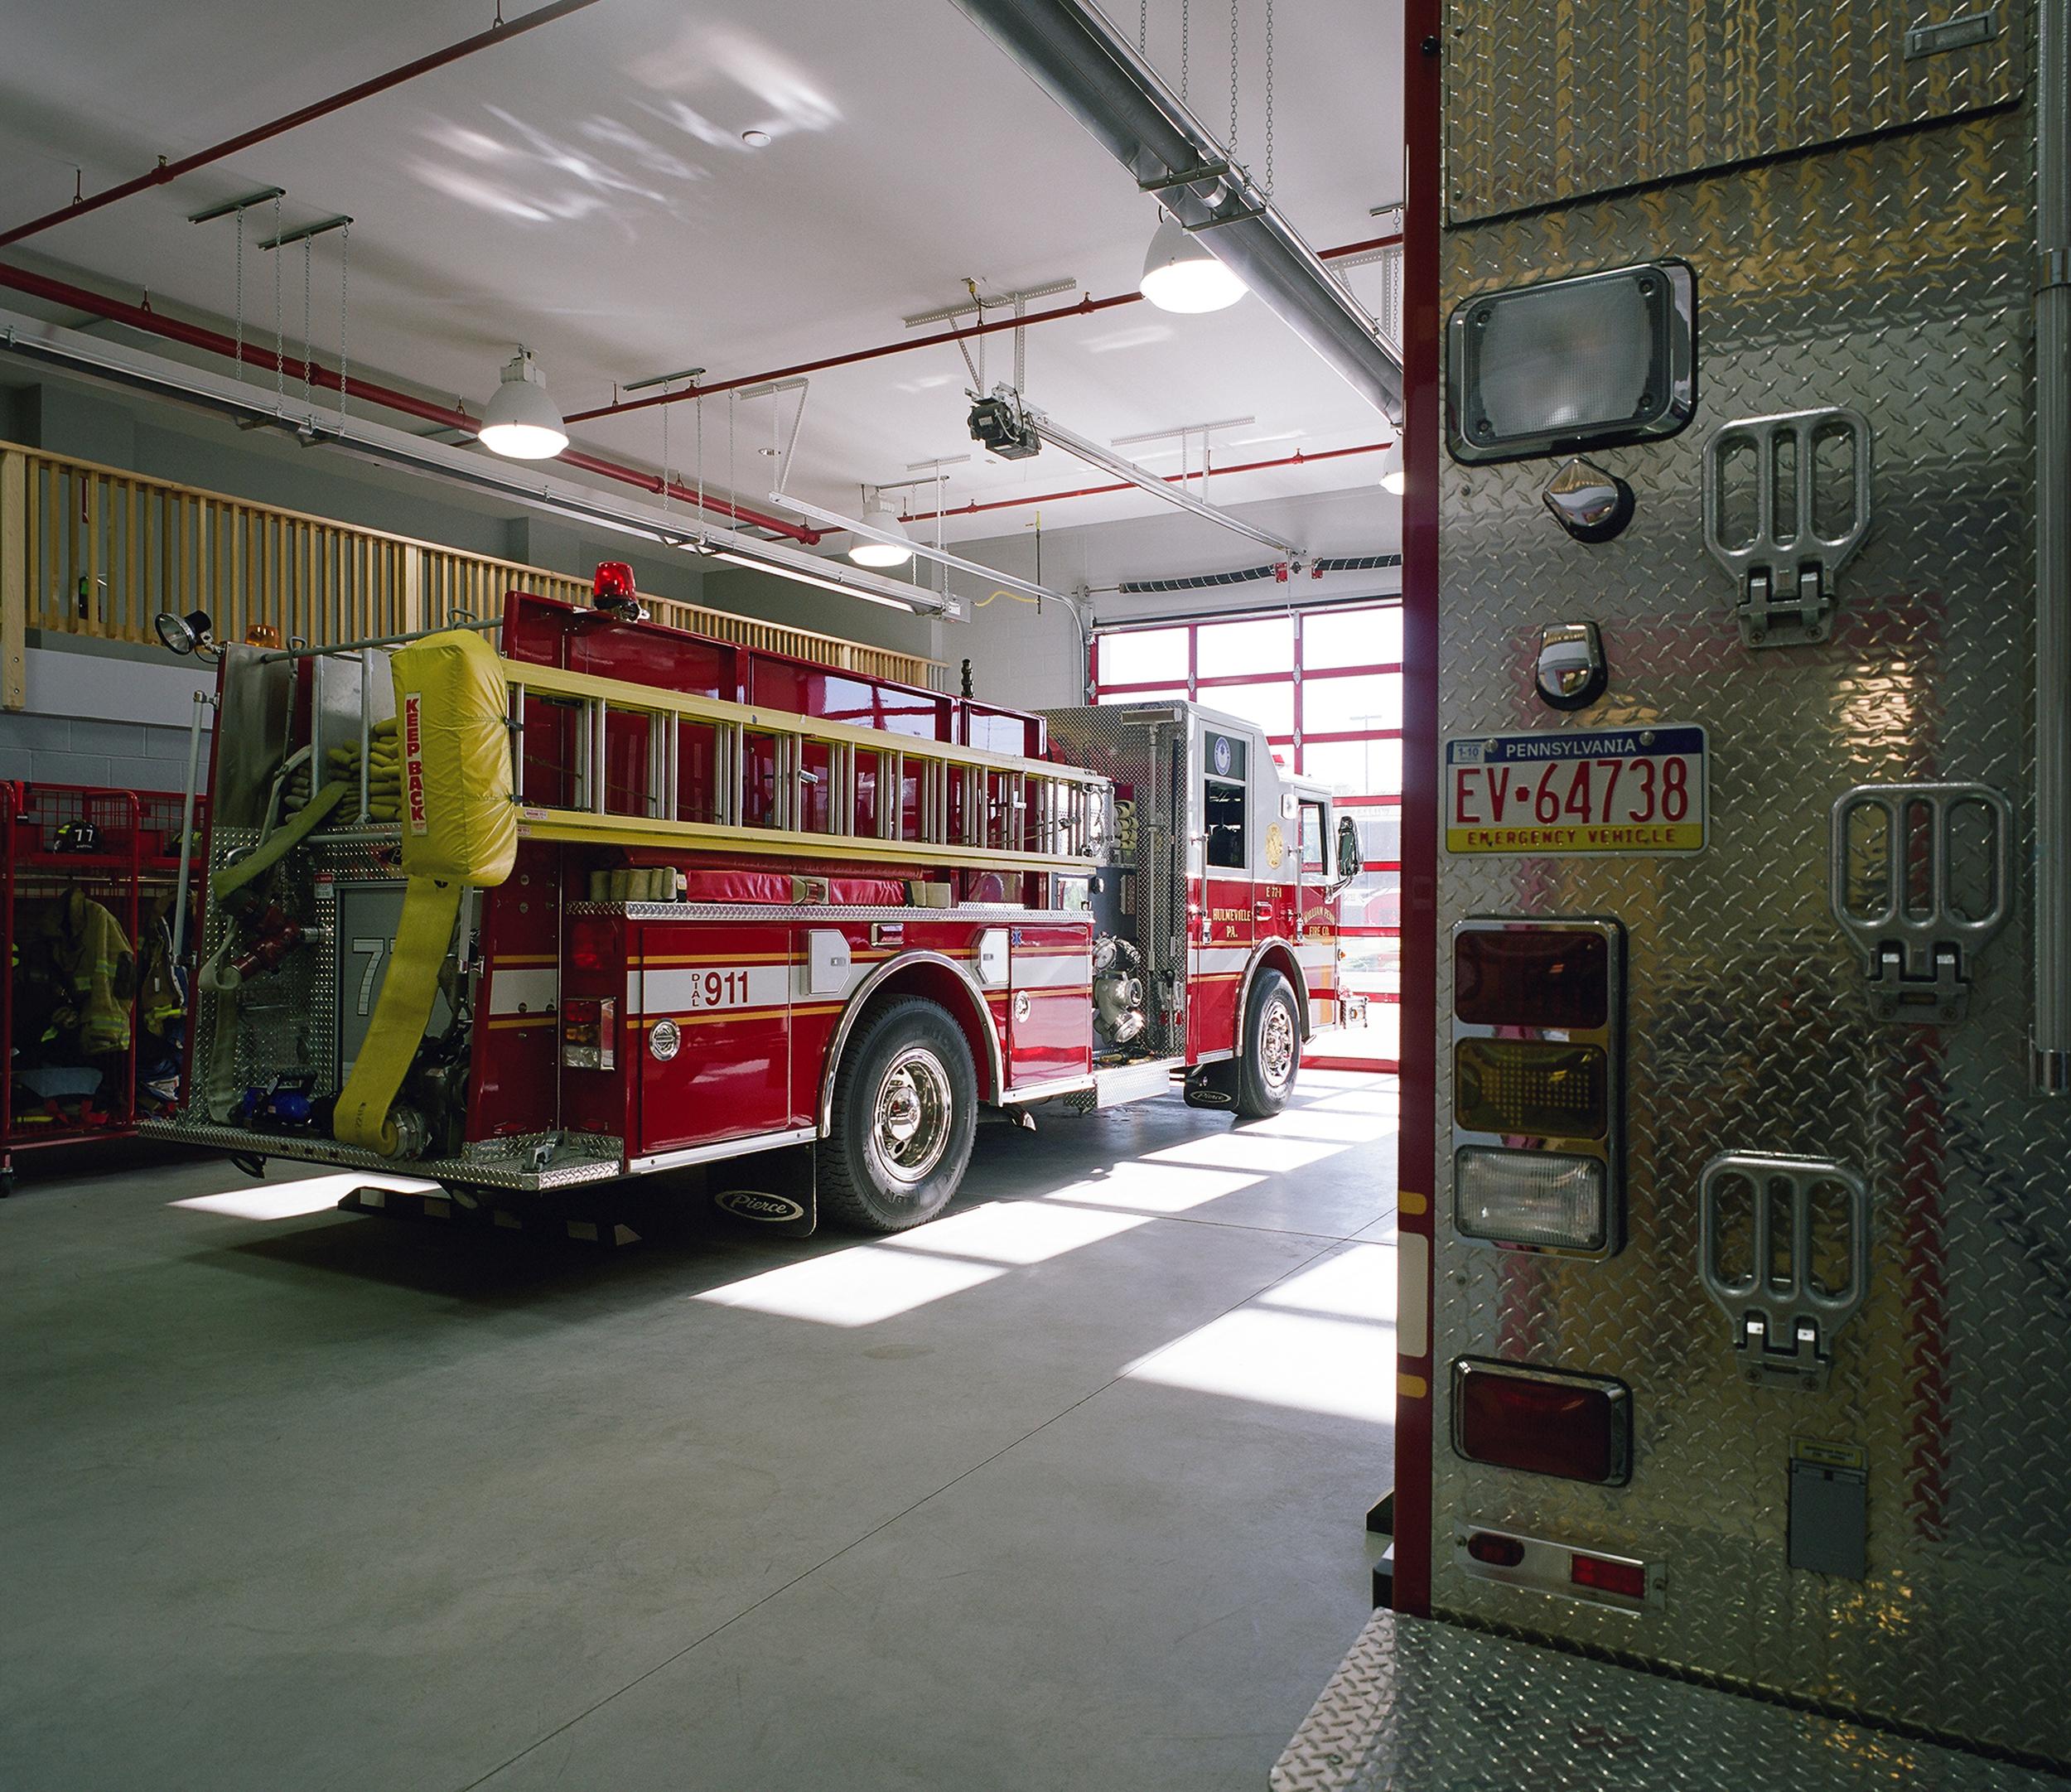 Wm. Penn Fire Co. 010.jpeg.jpg